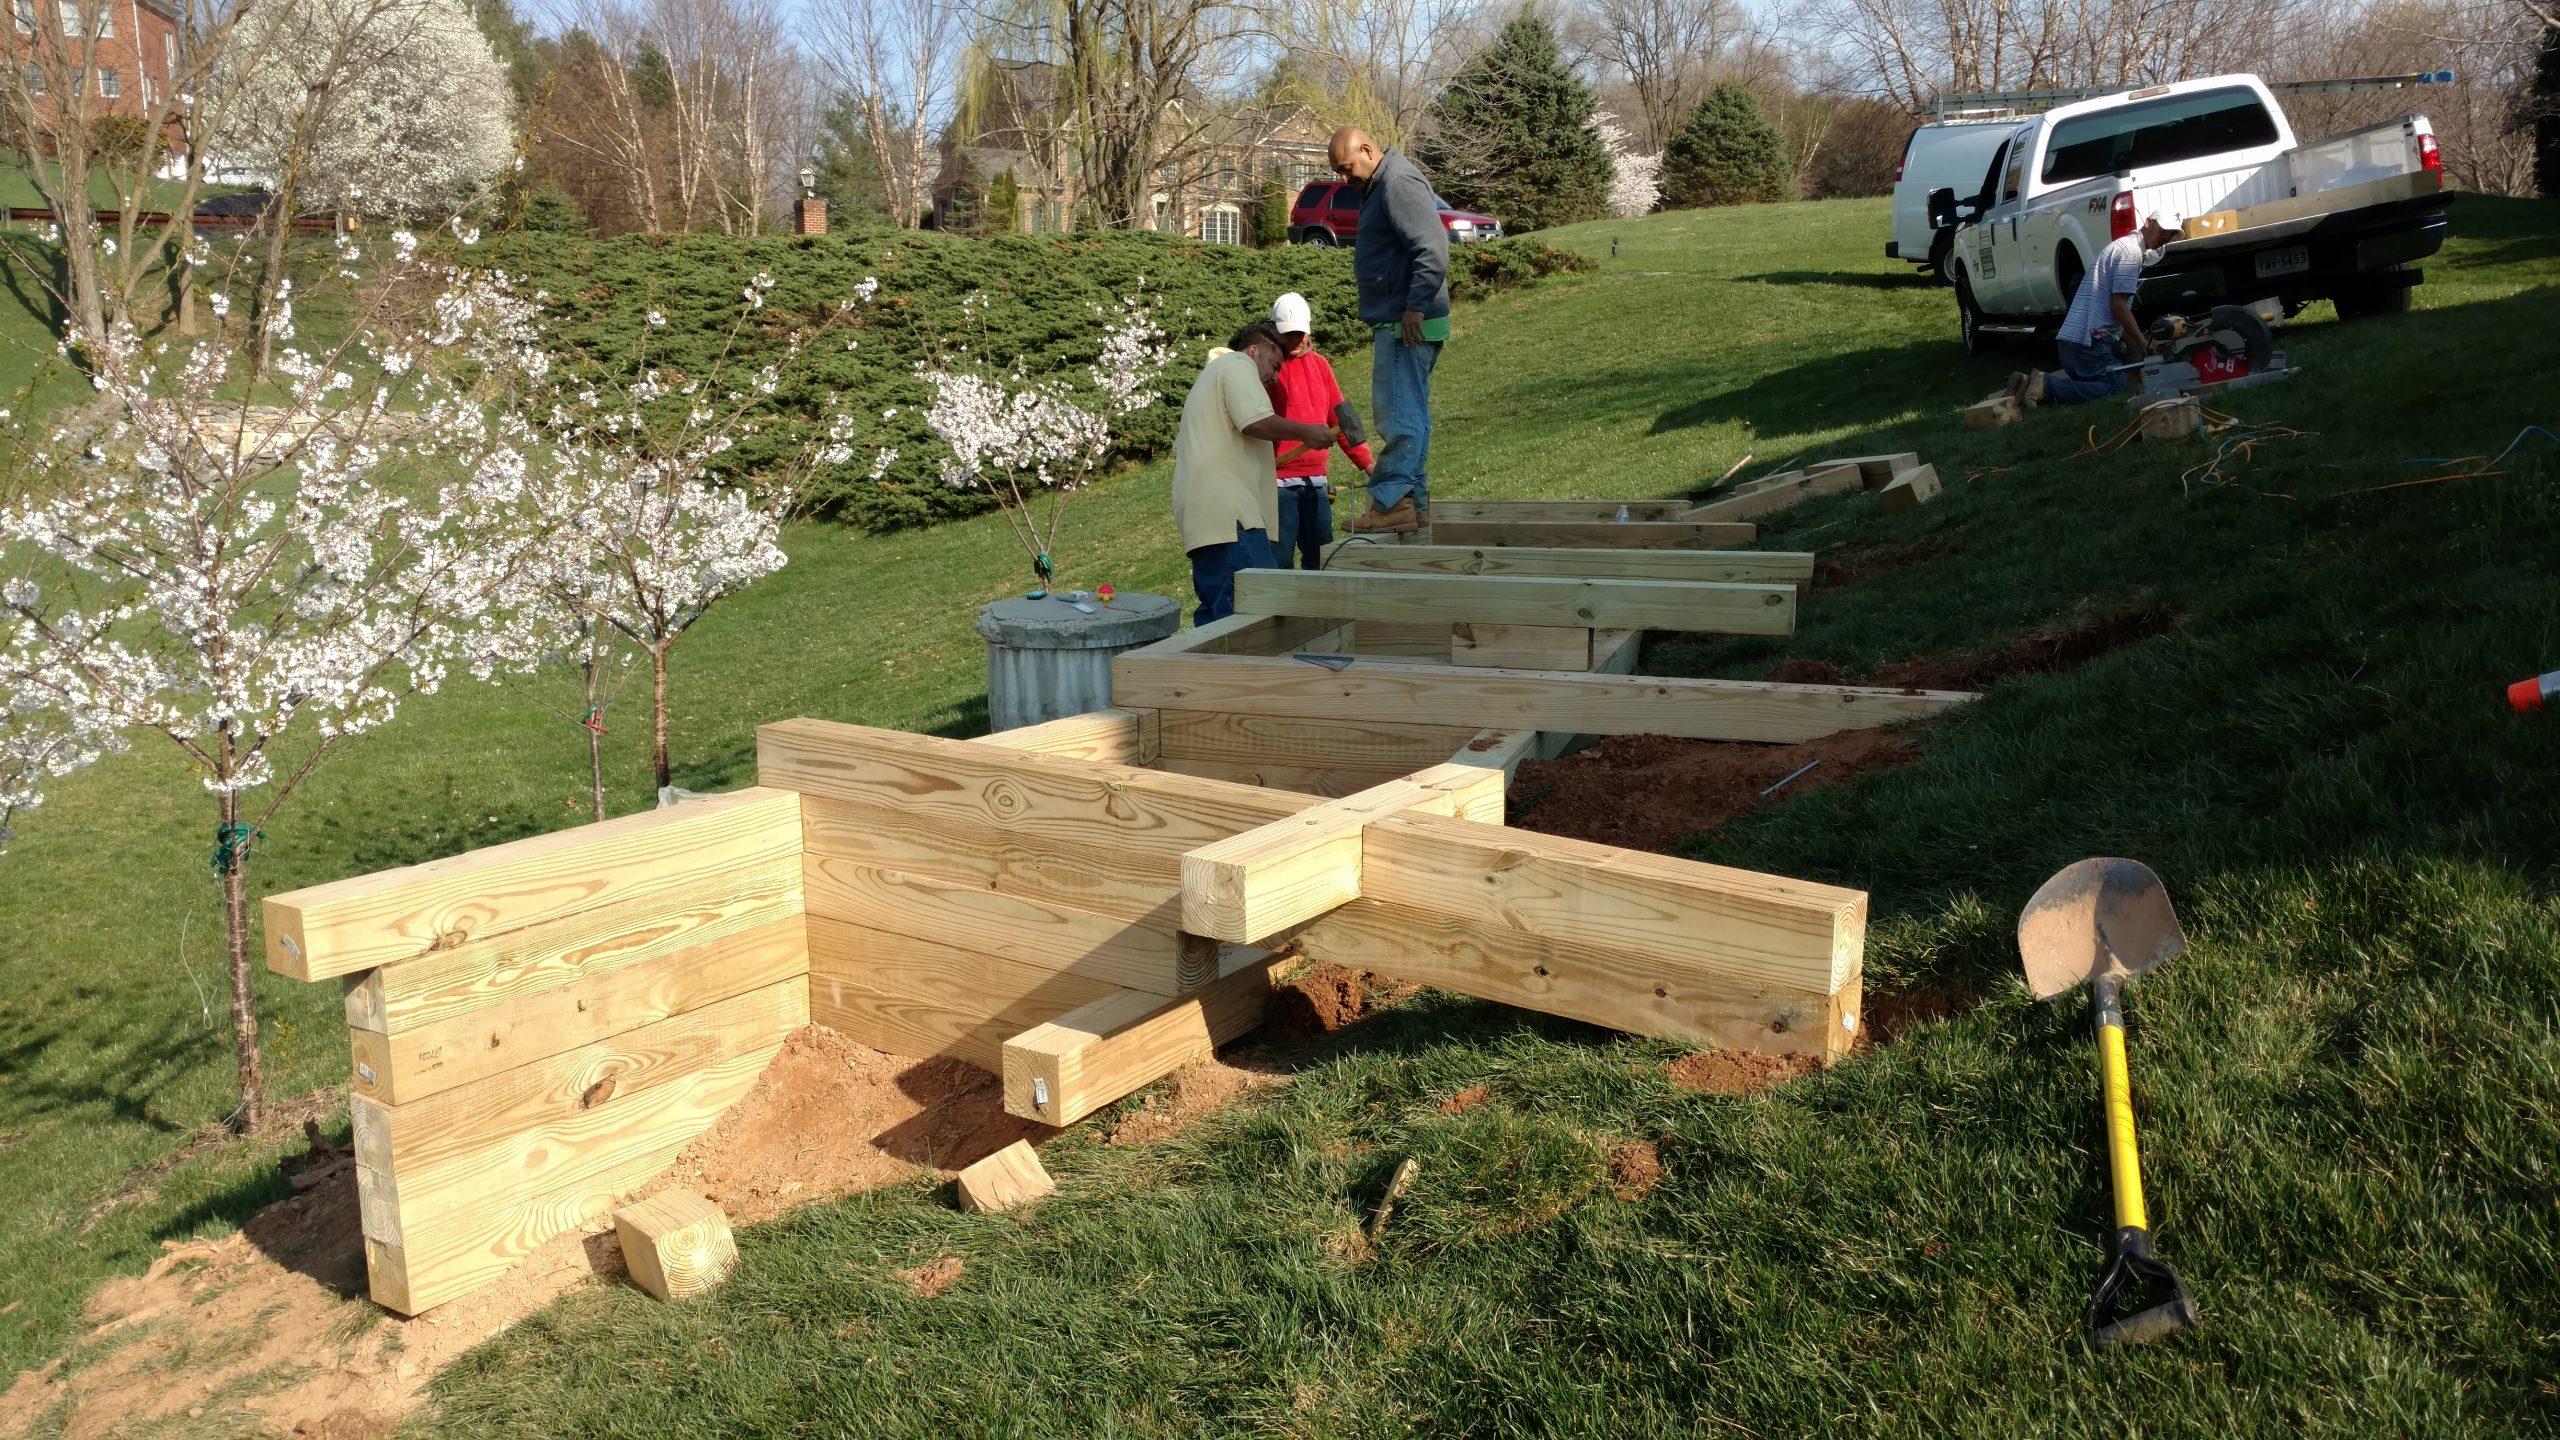 Pressure treated 6 x 6 wood retaining wall.